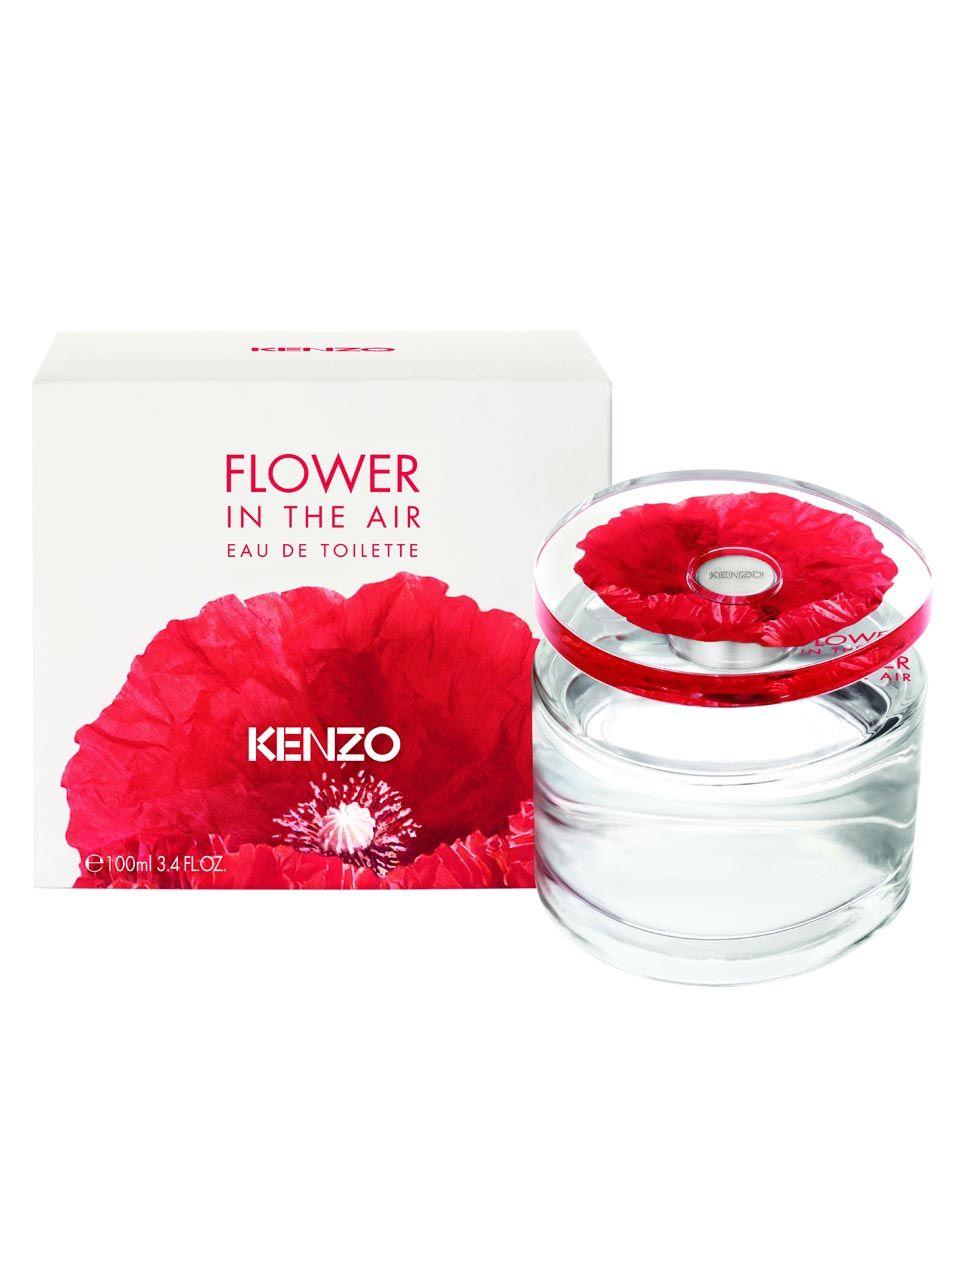 kenzo perfume flower in the air 50ml